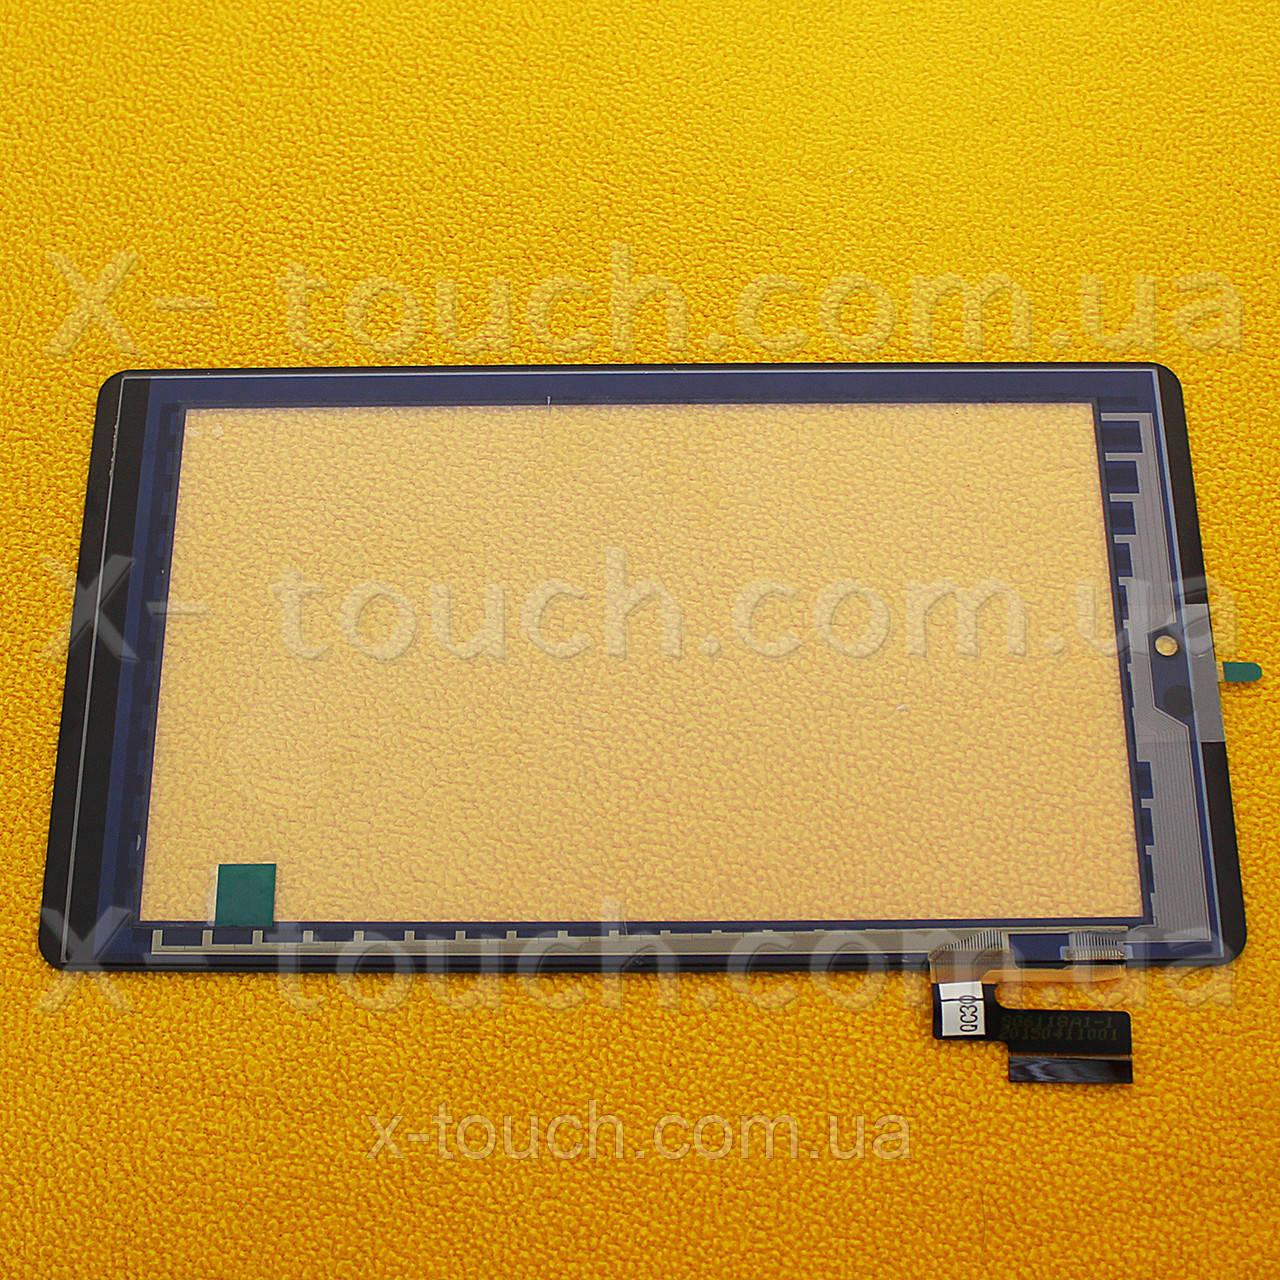 Тачскрин, сенсор  F0872 X  для планшета